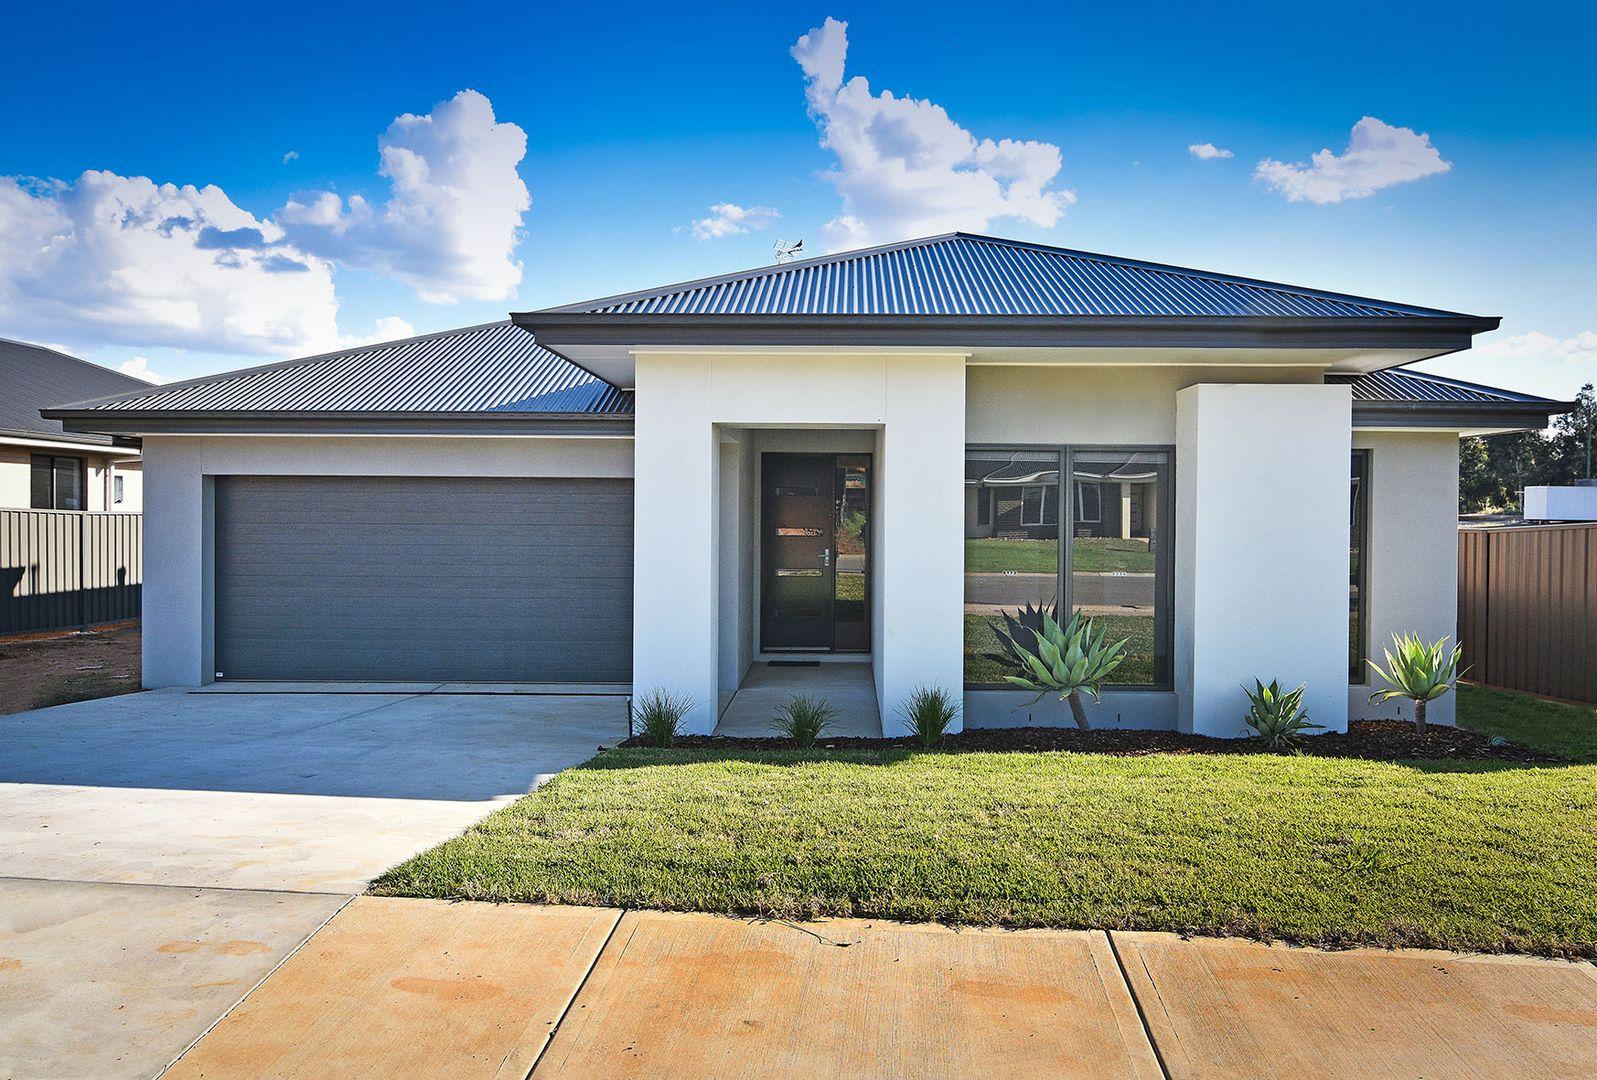 10 Stirling Way, Thurgoona NSW 2640, Image 0